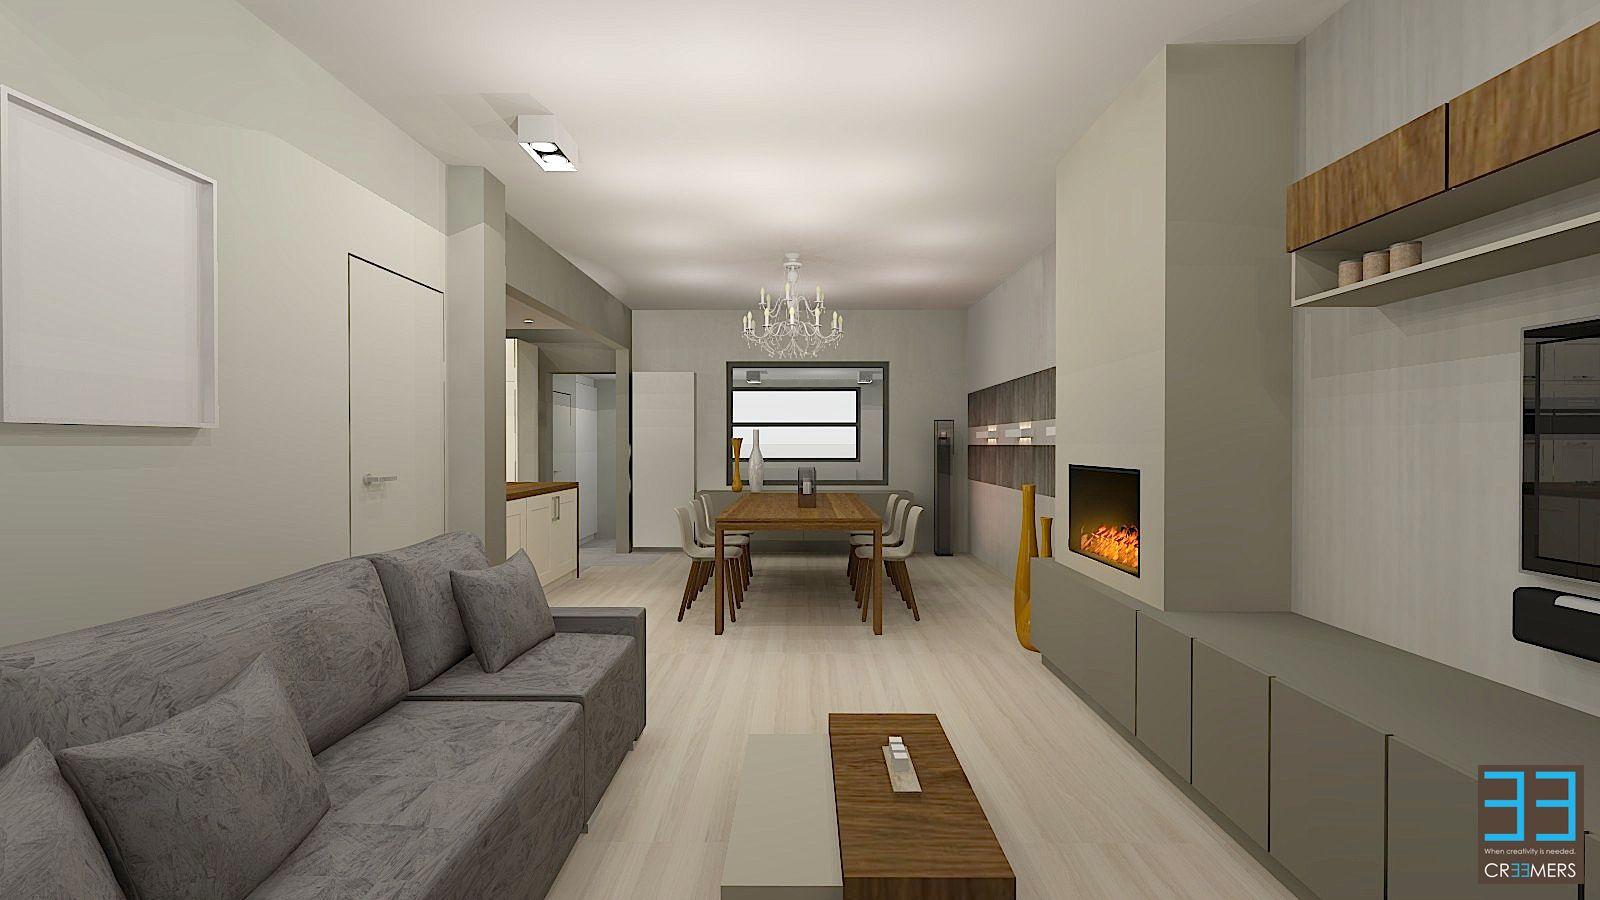 Lichte woonkamer met handige ideeën | Interieur inrichting ...